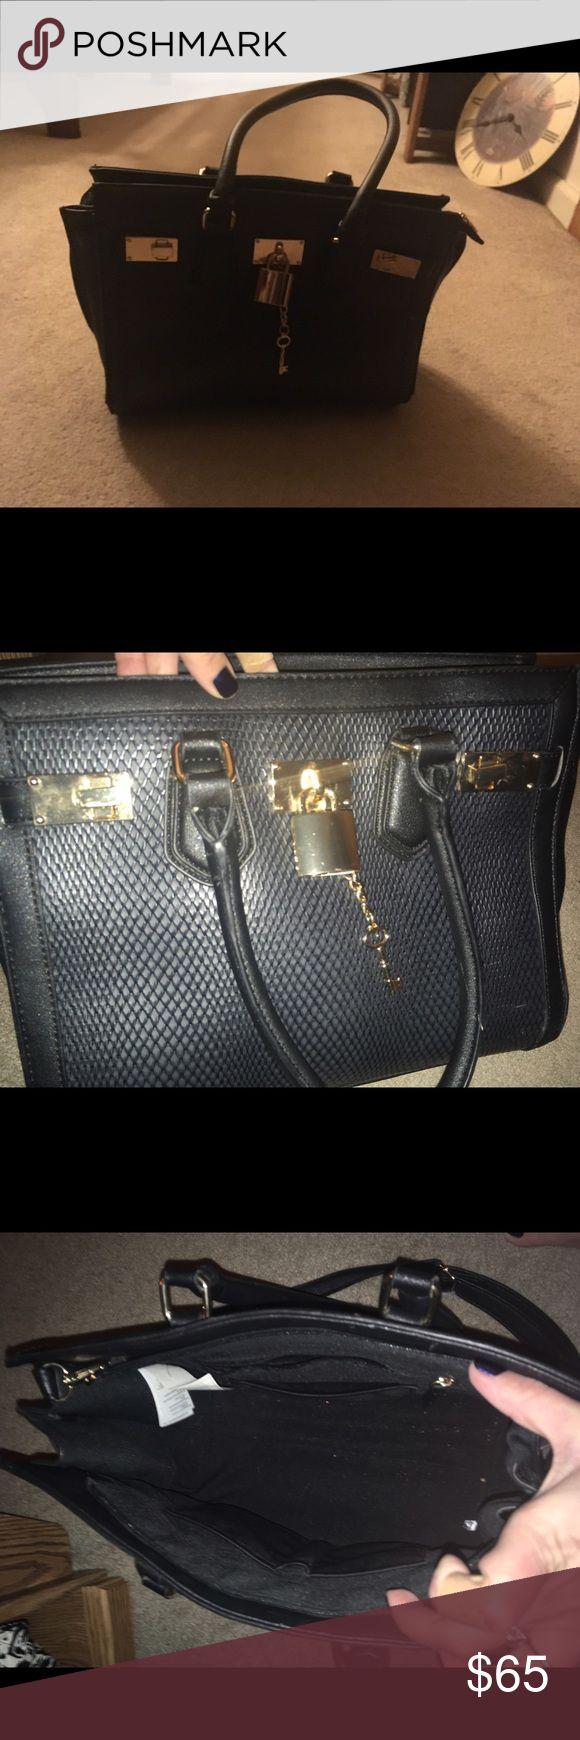 Best 20  Aldo handbags ideas on Pinterest   Aldo purses, Aldo bags ...